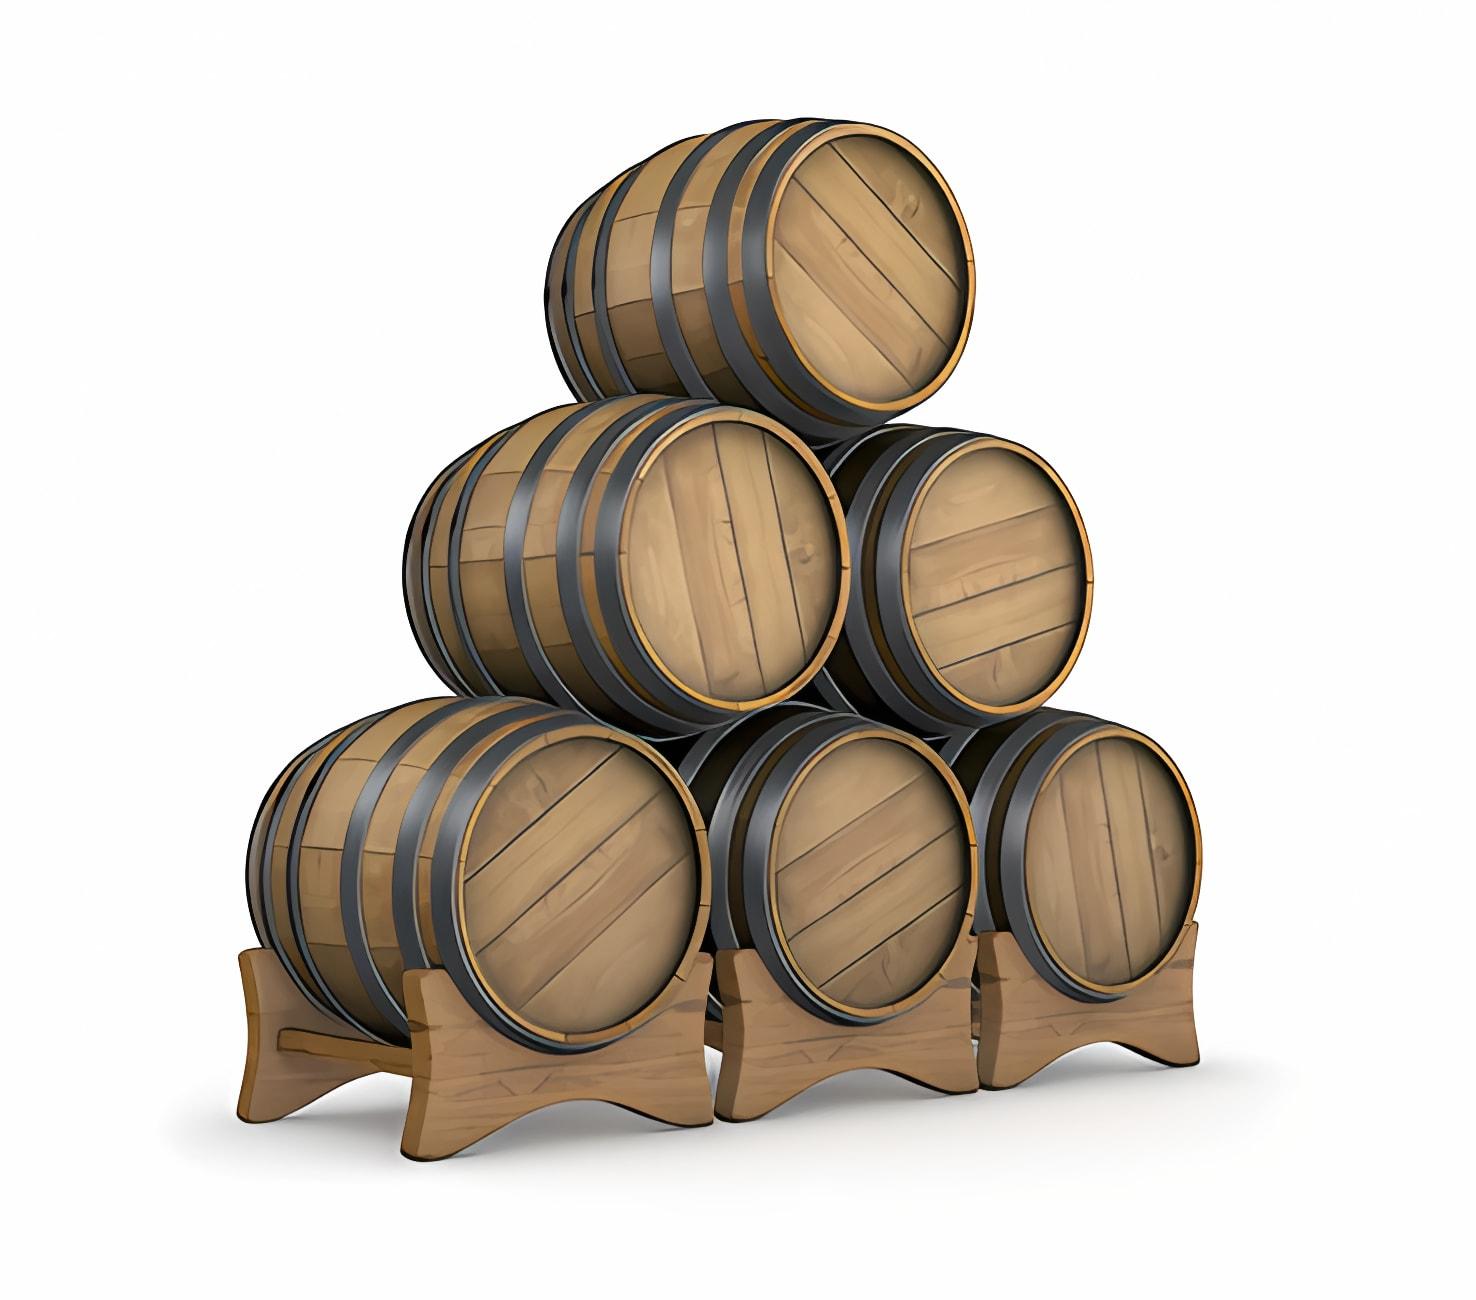 GS Whiskyverwaltung